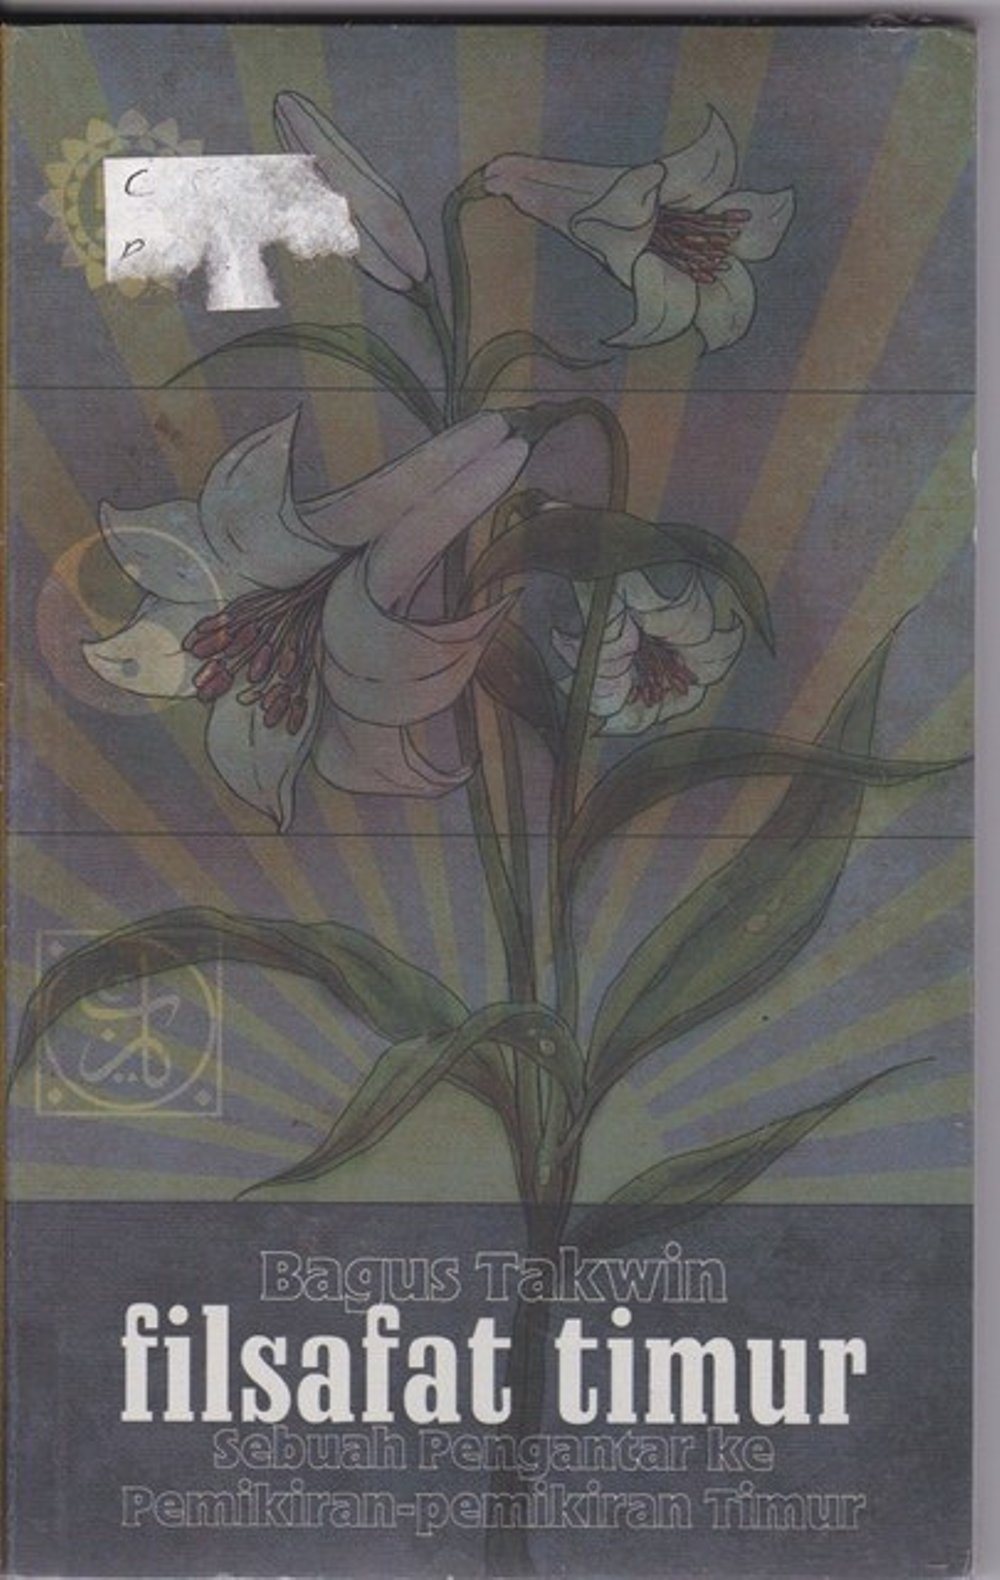 FILSAFAT TIMUR : Sebuah Pengantar ke Pemikiran Timur